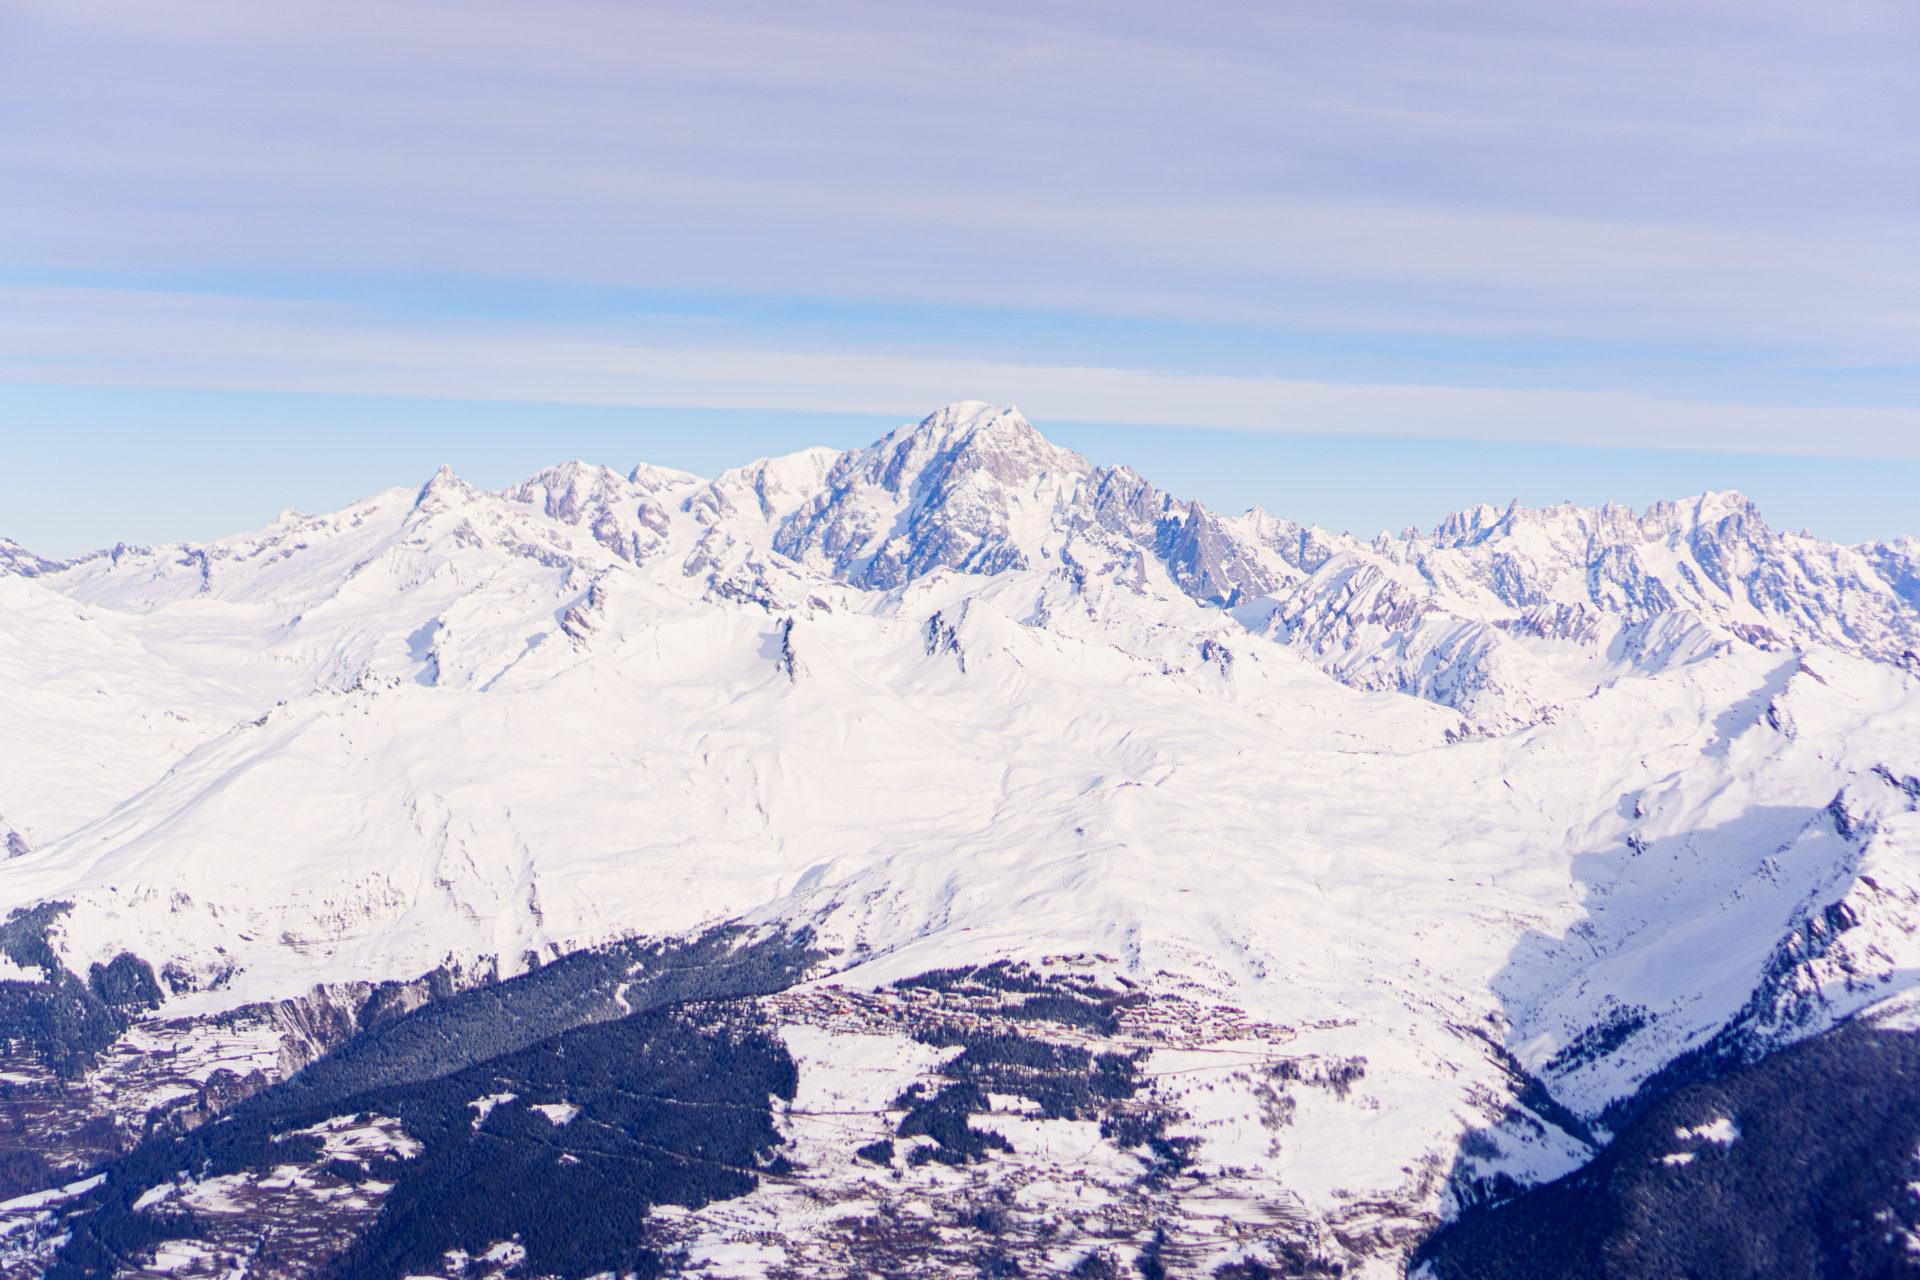 Les Arcs Frankrijk, een duurzame bestemming